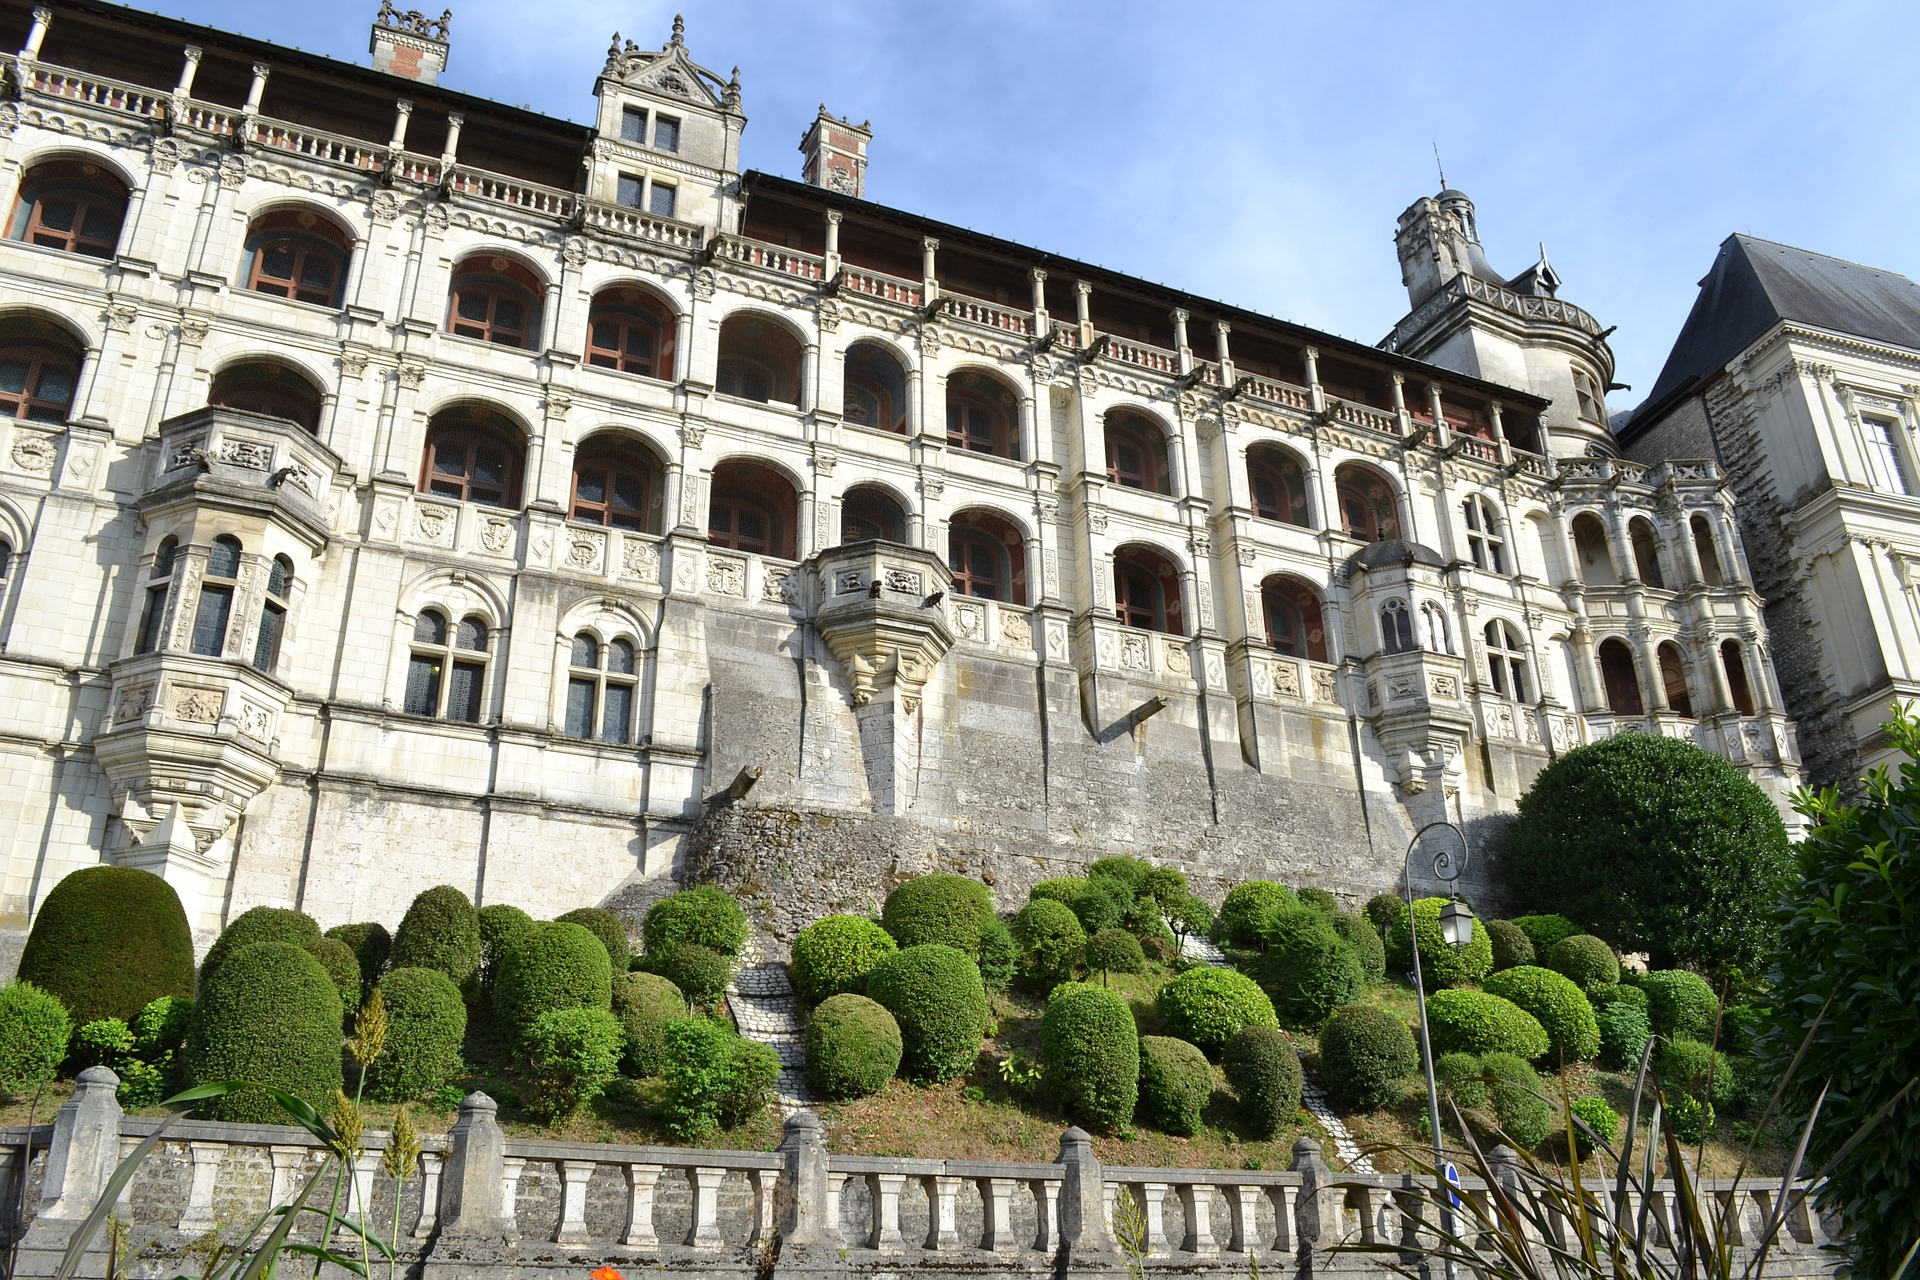 Castles of Loire Valley